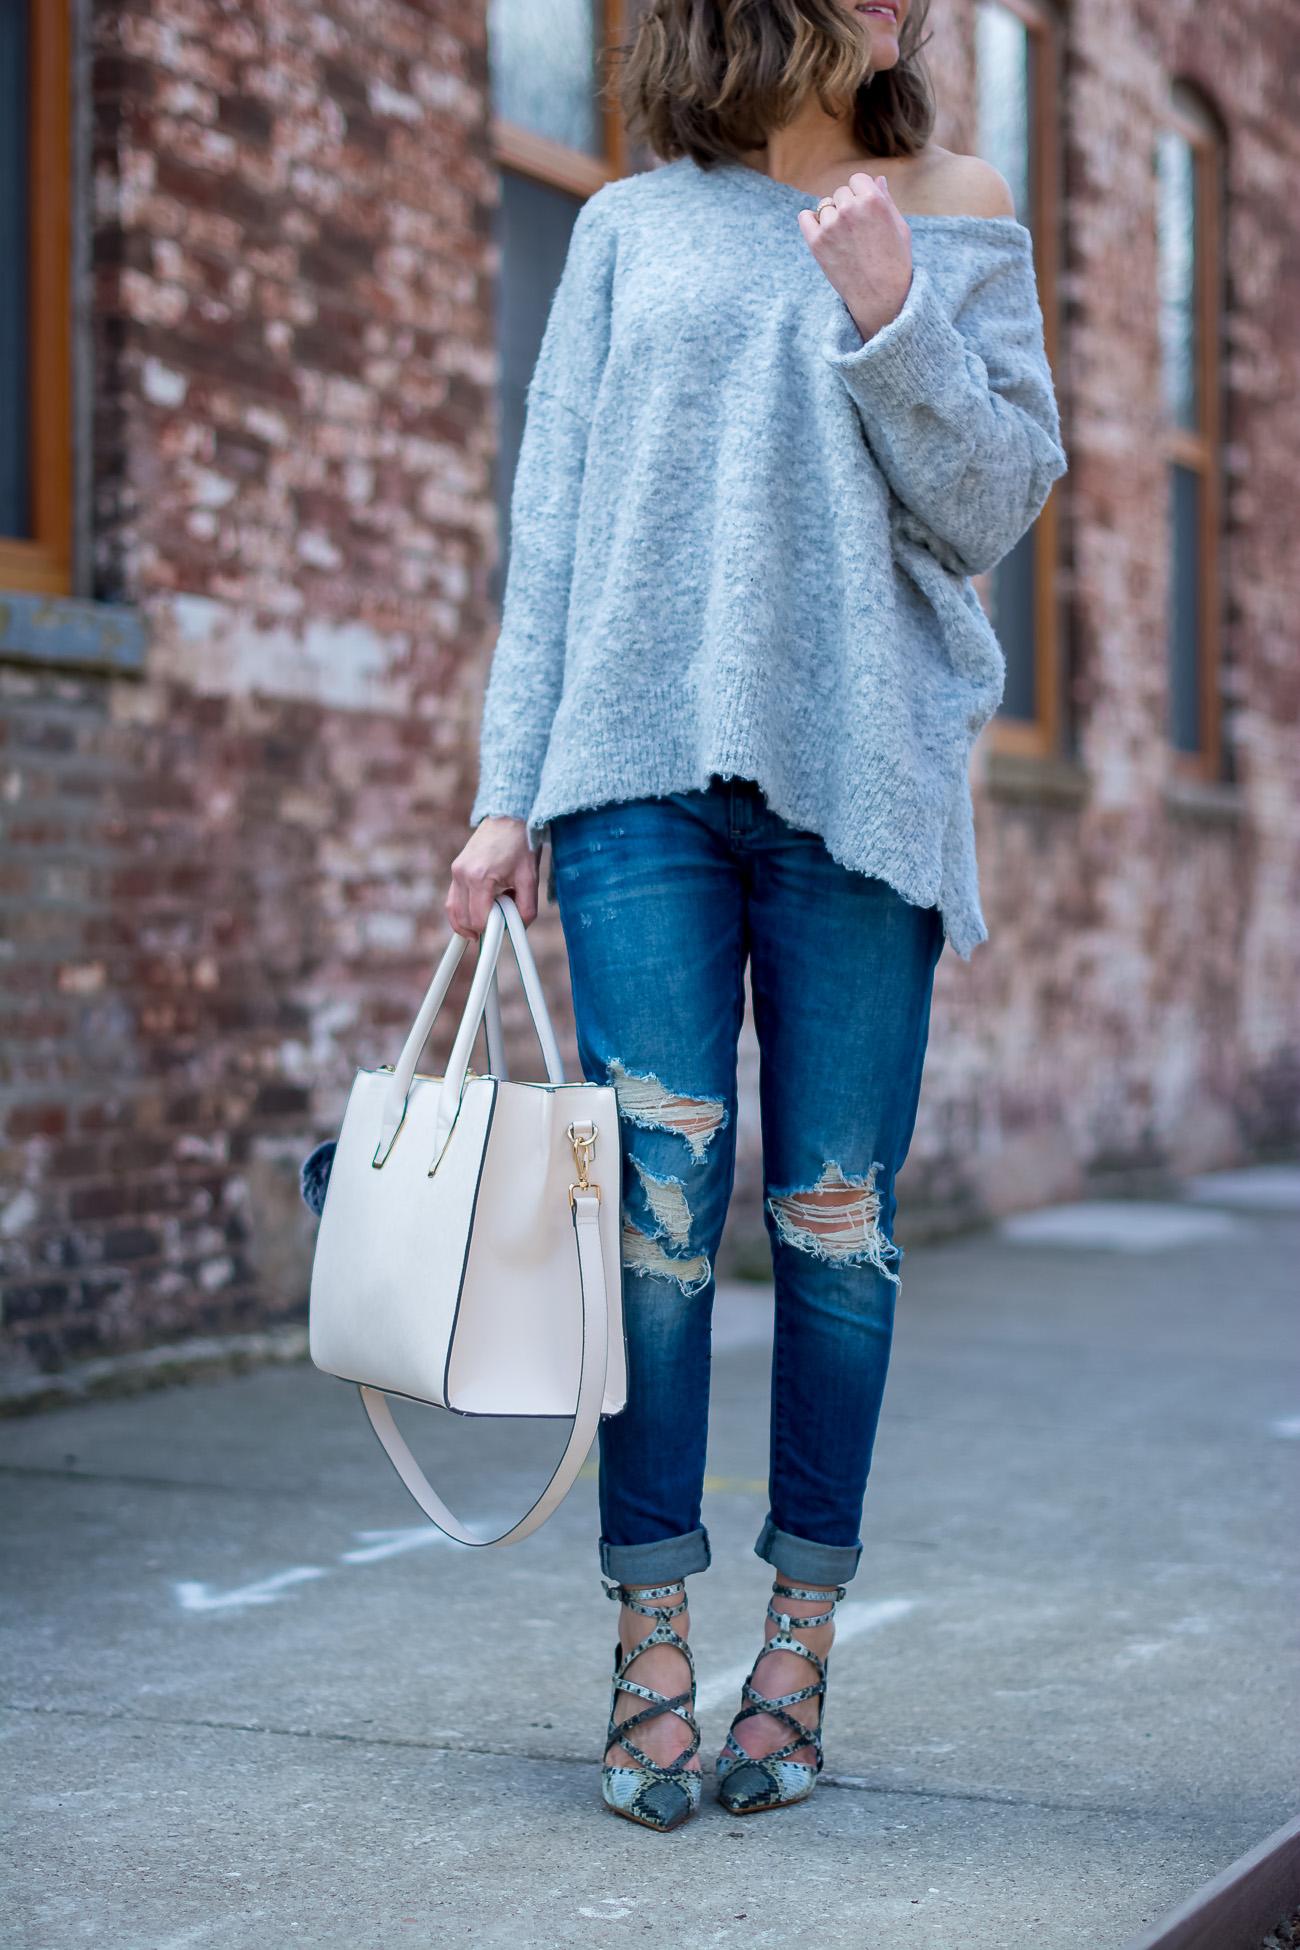 grey-off-the-shoulder-sweater-boyfriend-jeans-snakeskin-heels-blush-tote-mirrored-aviators